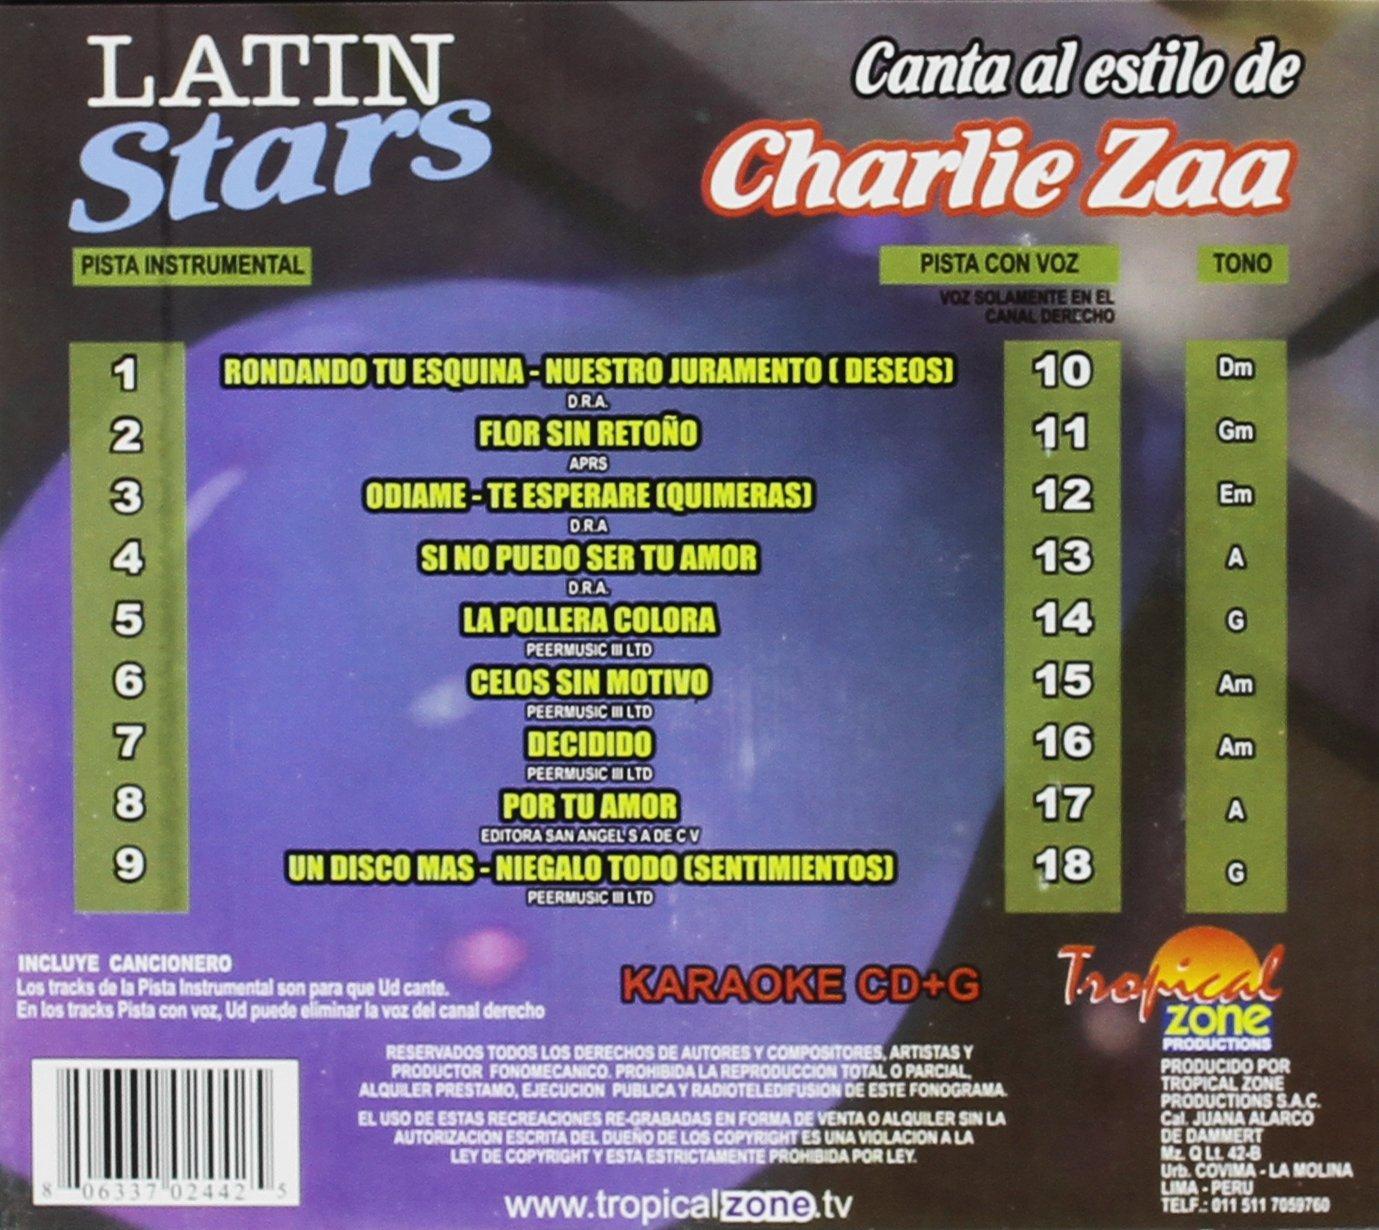 Charlie Zaa - Karaoke: Charlie Zaa - Latin Stars Karaoke - Amazon.com Music